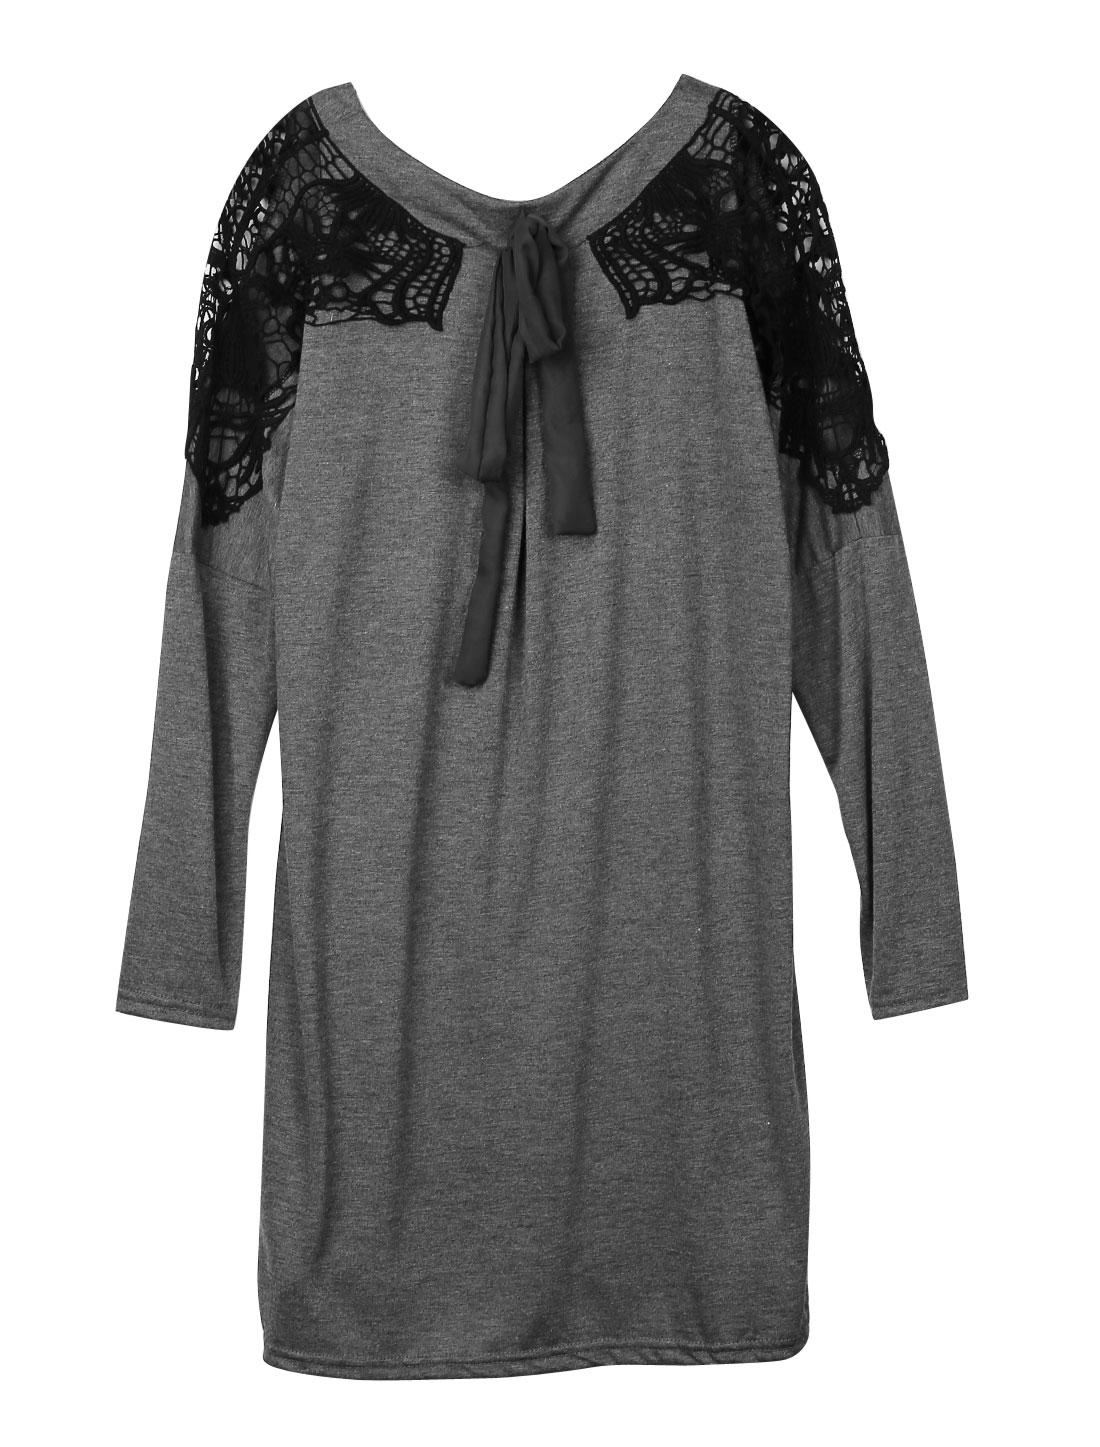 Women Round Neck Batwing Sleeves Panel Pullover Dress Dark Heather Gray S